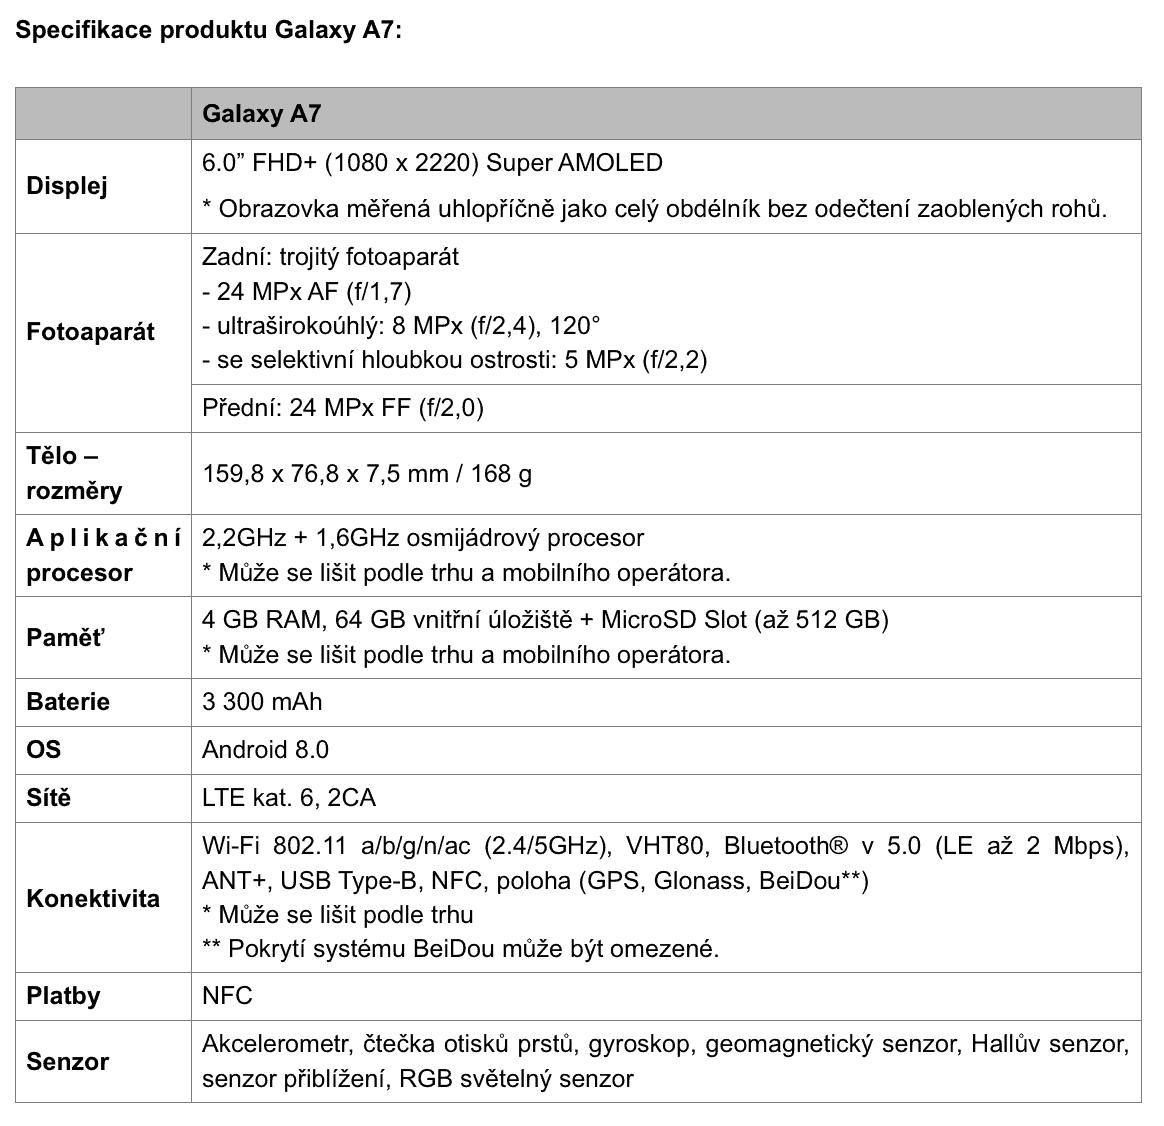 Specifikace galaxy A7